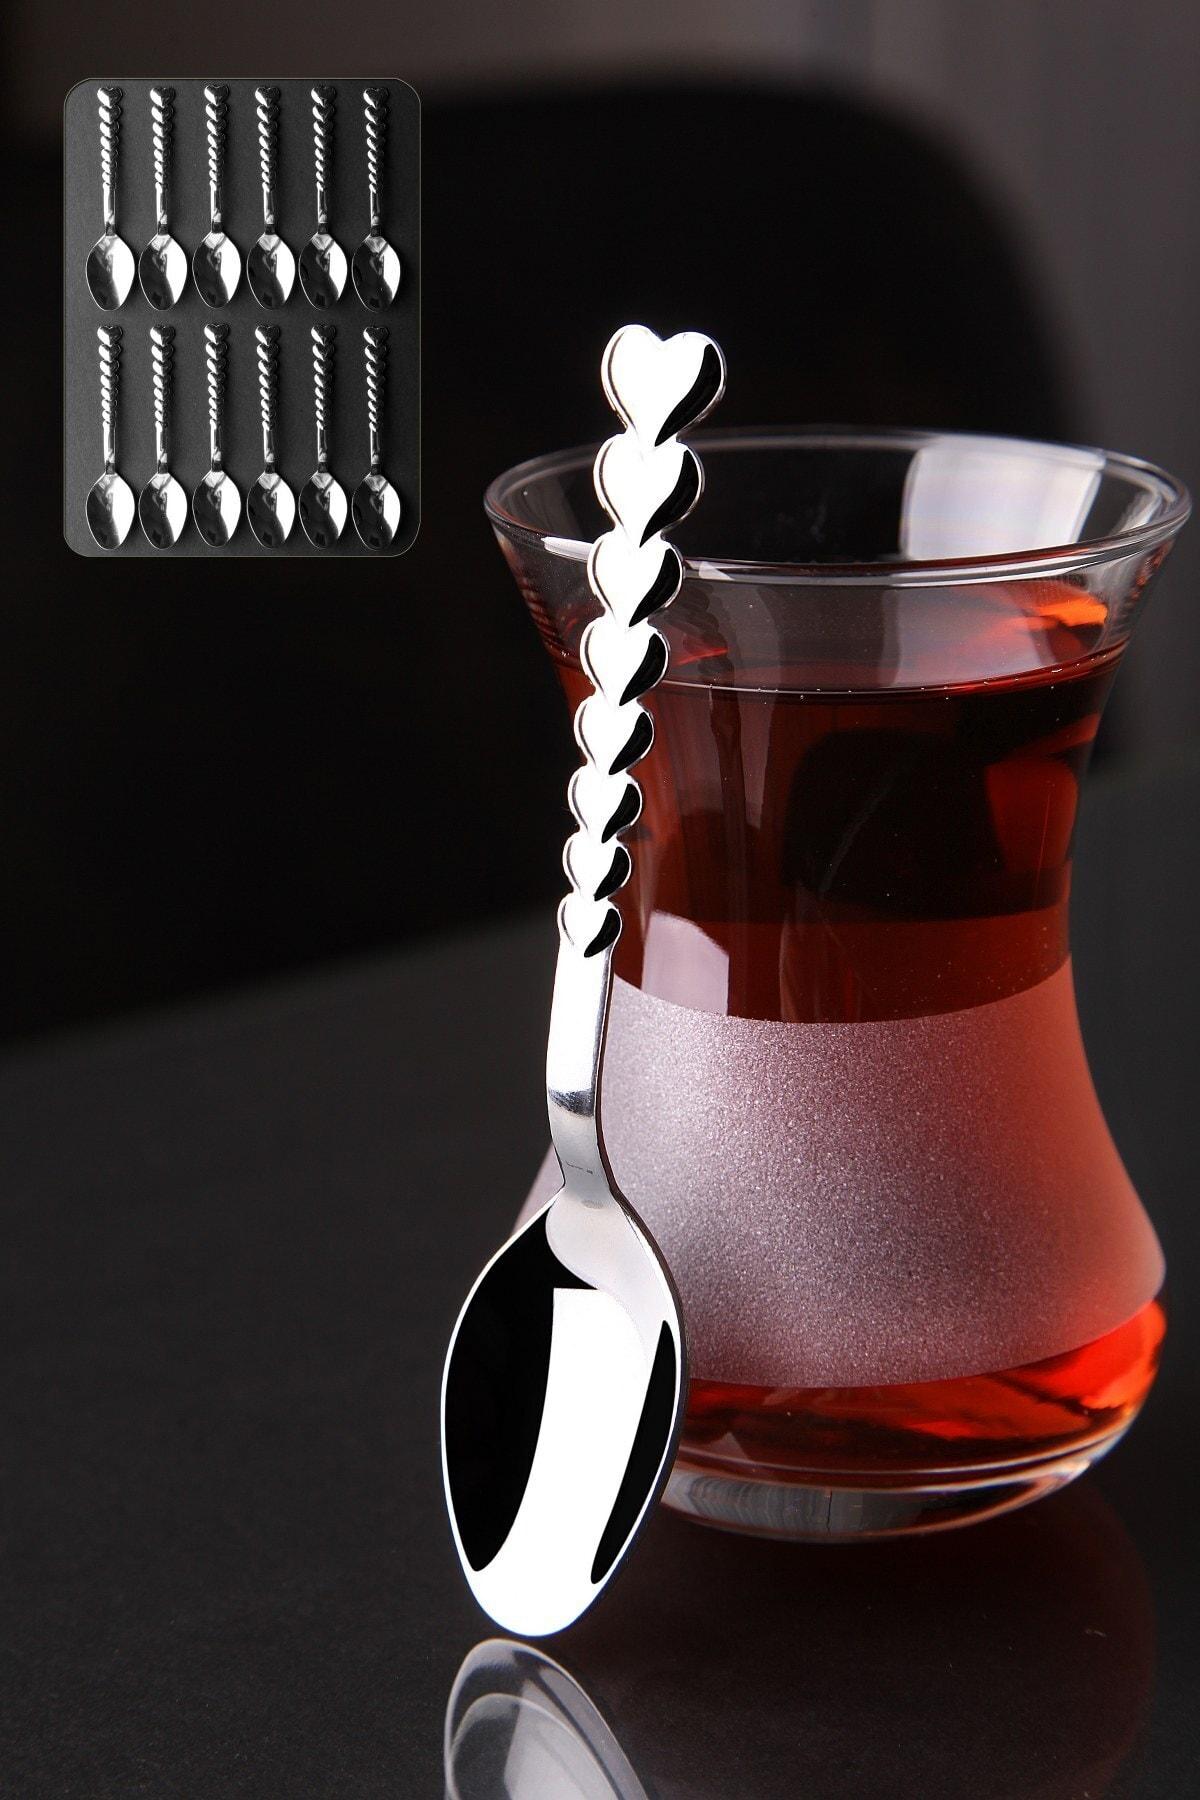 Kitchen Life 12 Adet Kalpli Paslanmaz Çelik Çay Kaşık Seti 1